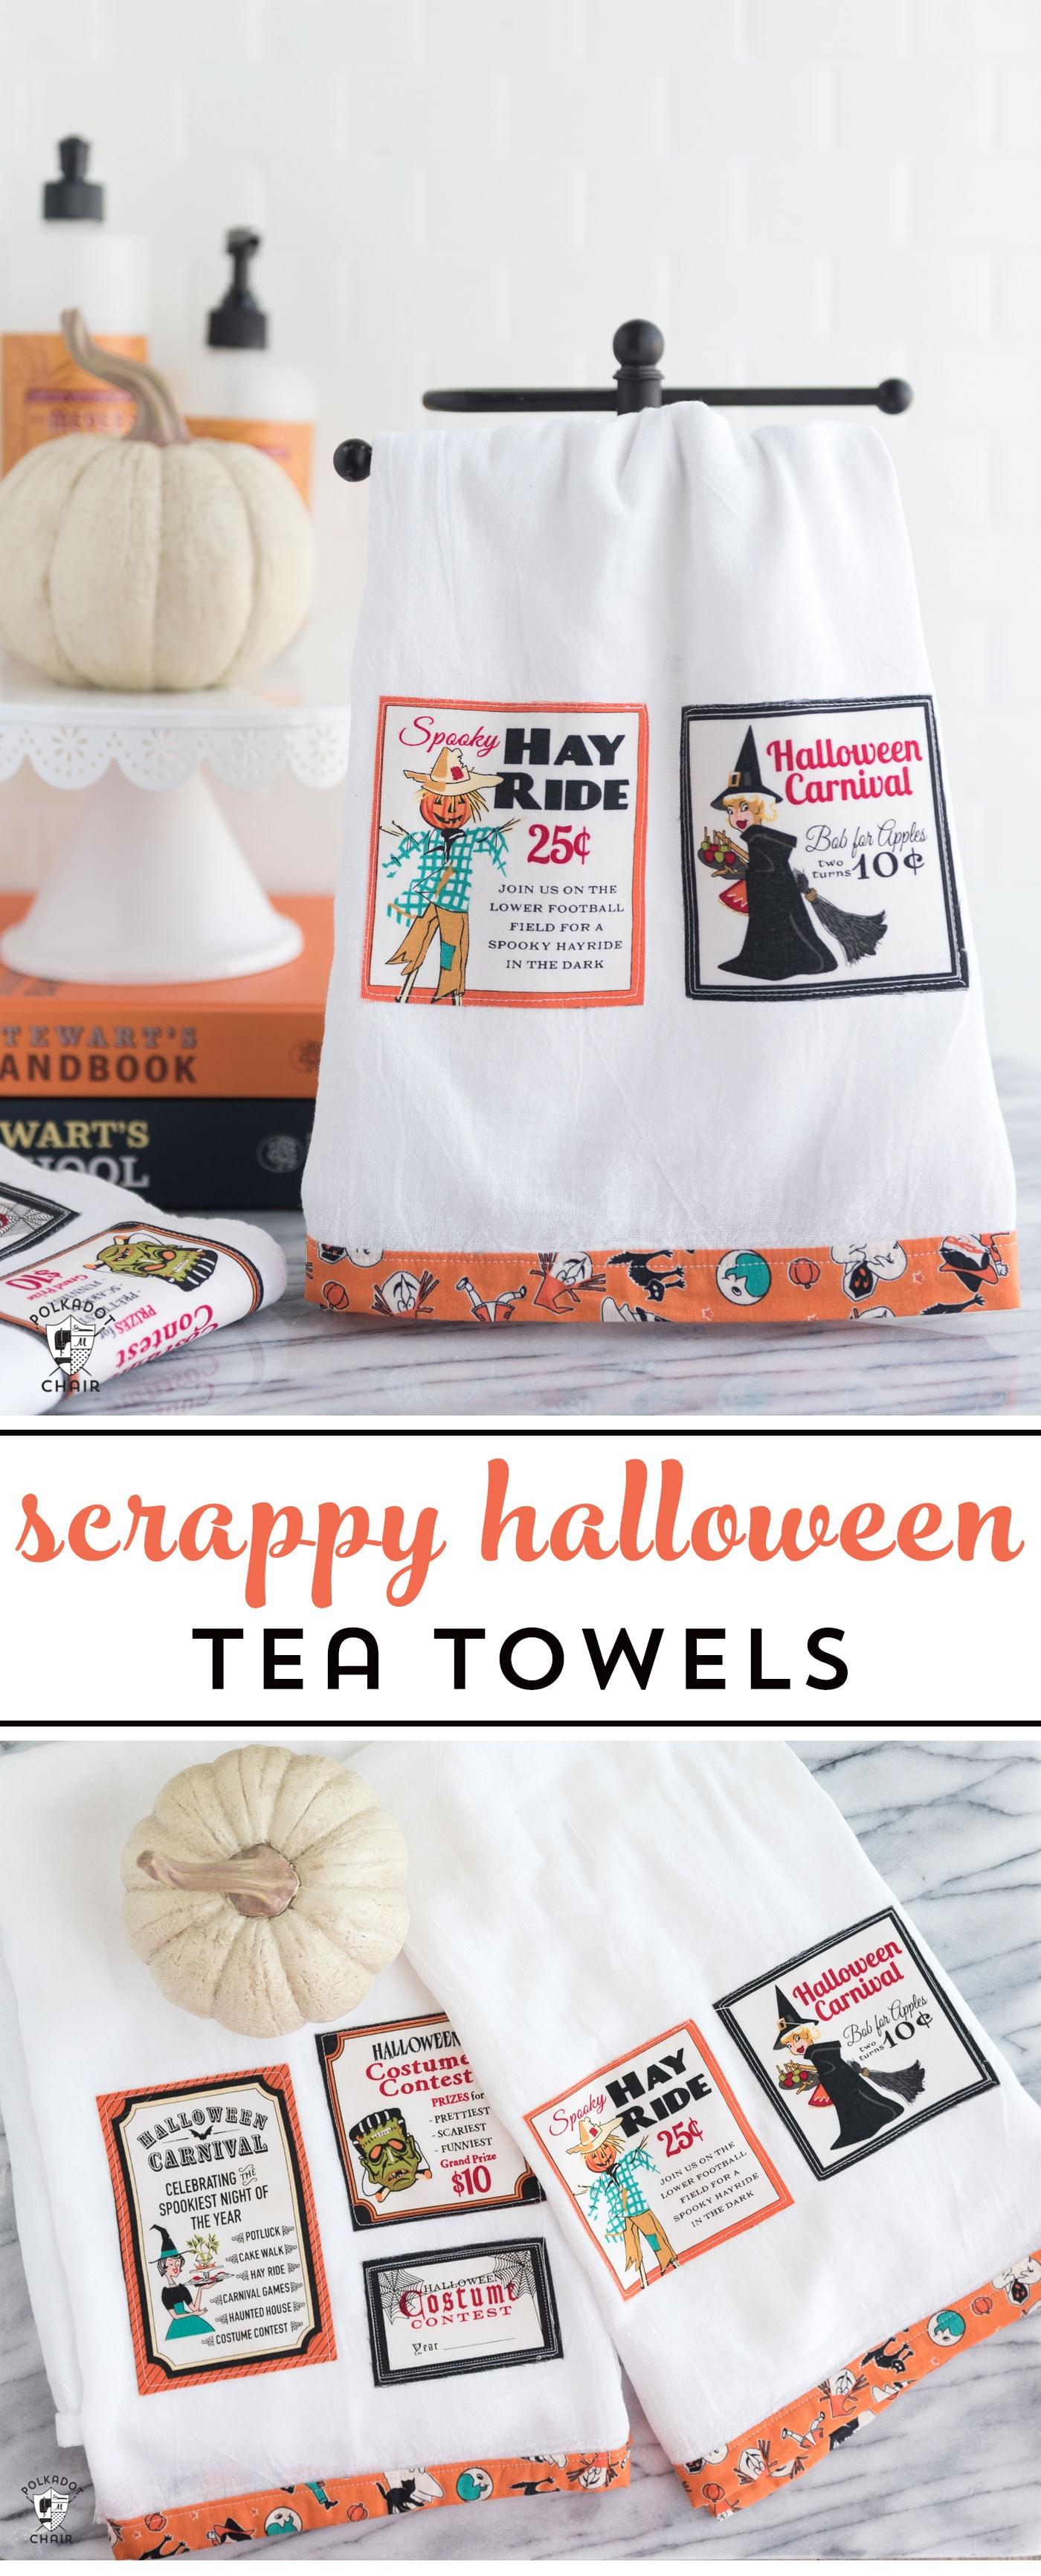 Free sewing tutorial for a DIY Halloween Tea Towel - such a cute project and a great way to use up fabric scraps!  #halloween #halloweensewing #halloweengifts #gifts #giftideas #halloweenfabric #tutorial #sew #rileyblake #teatowel #diyteatowel #diydishtowel #dishtowel